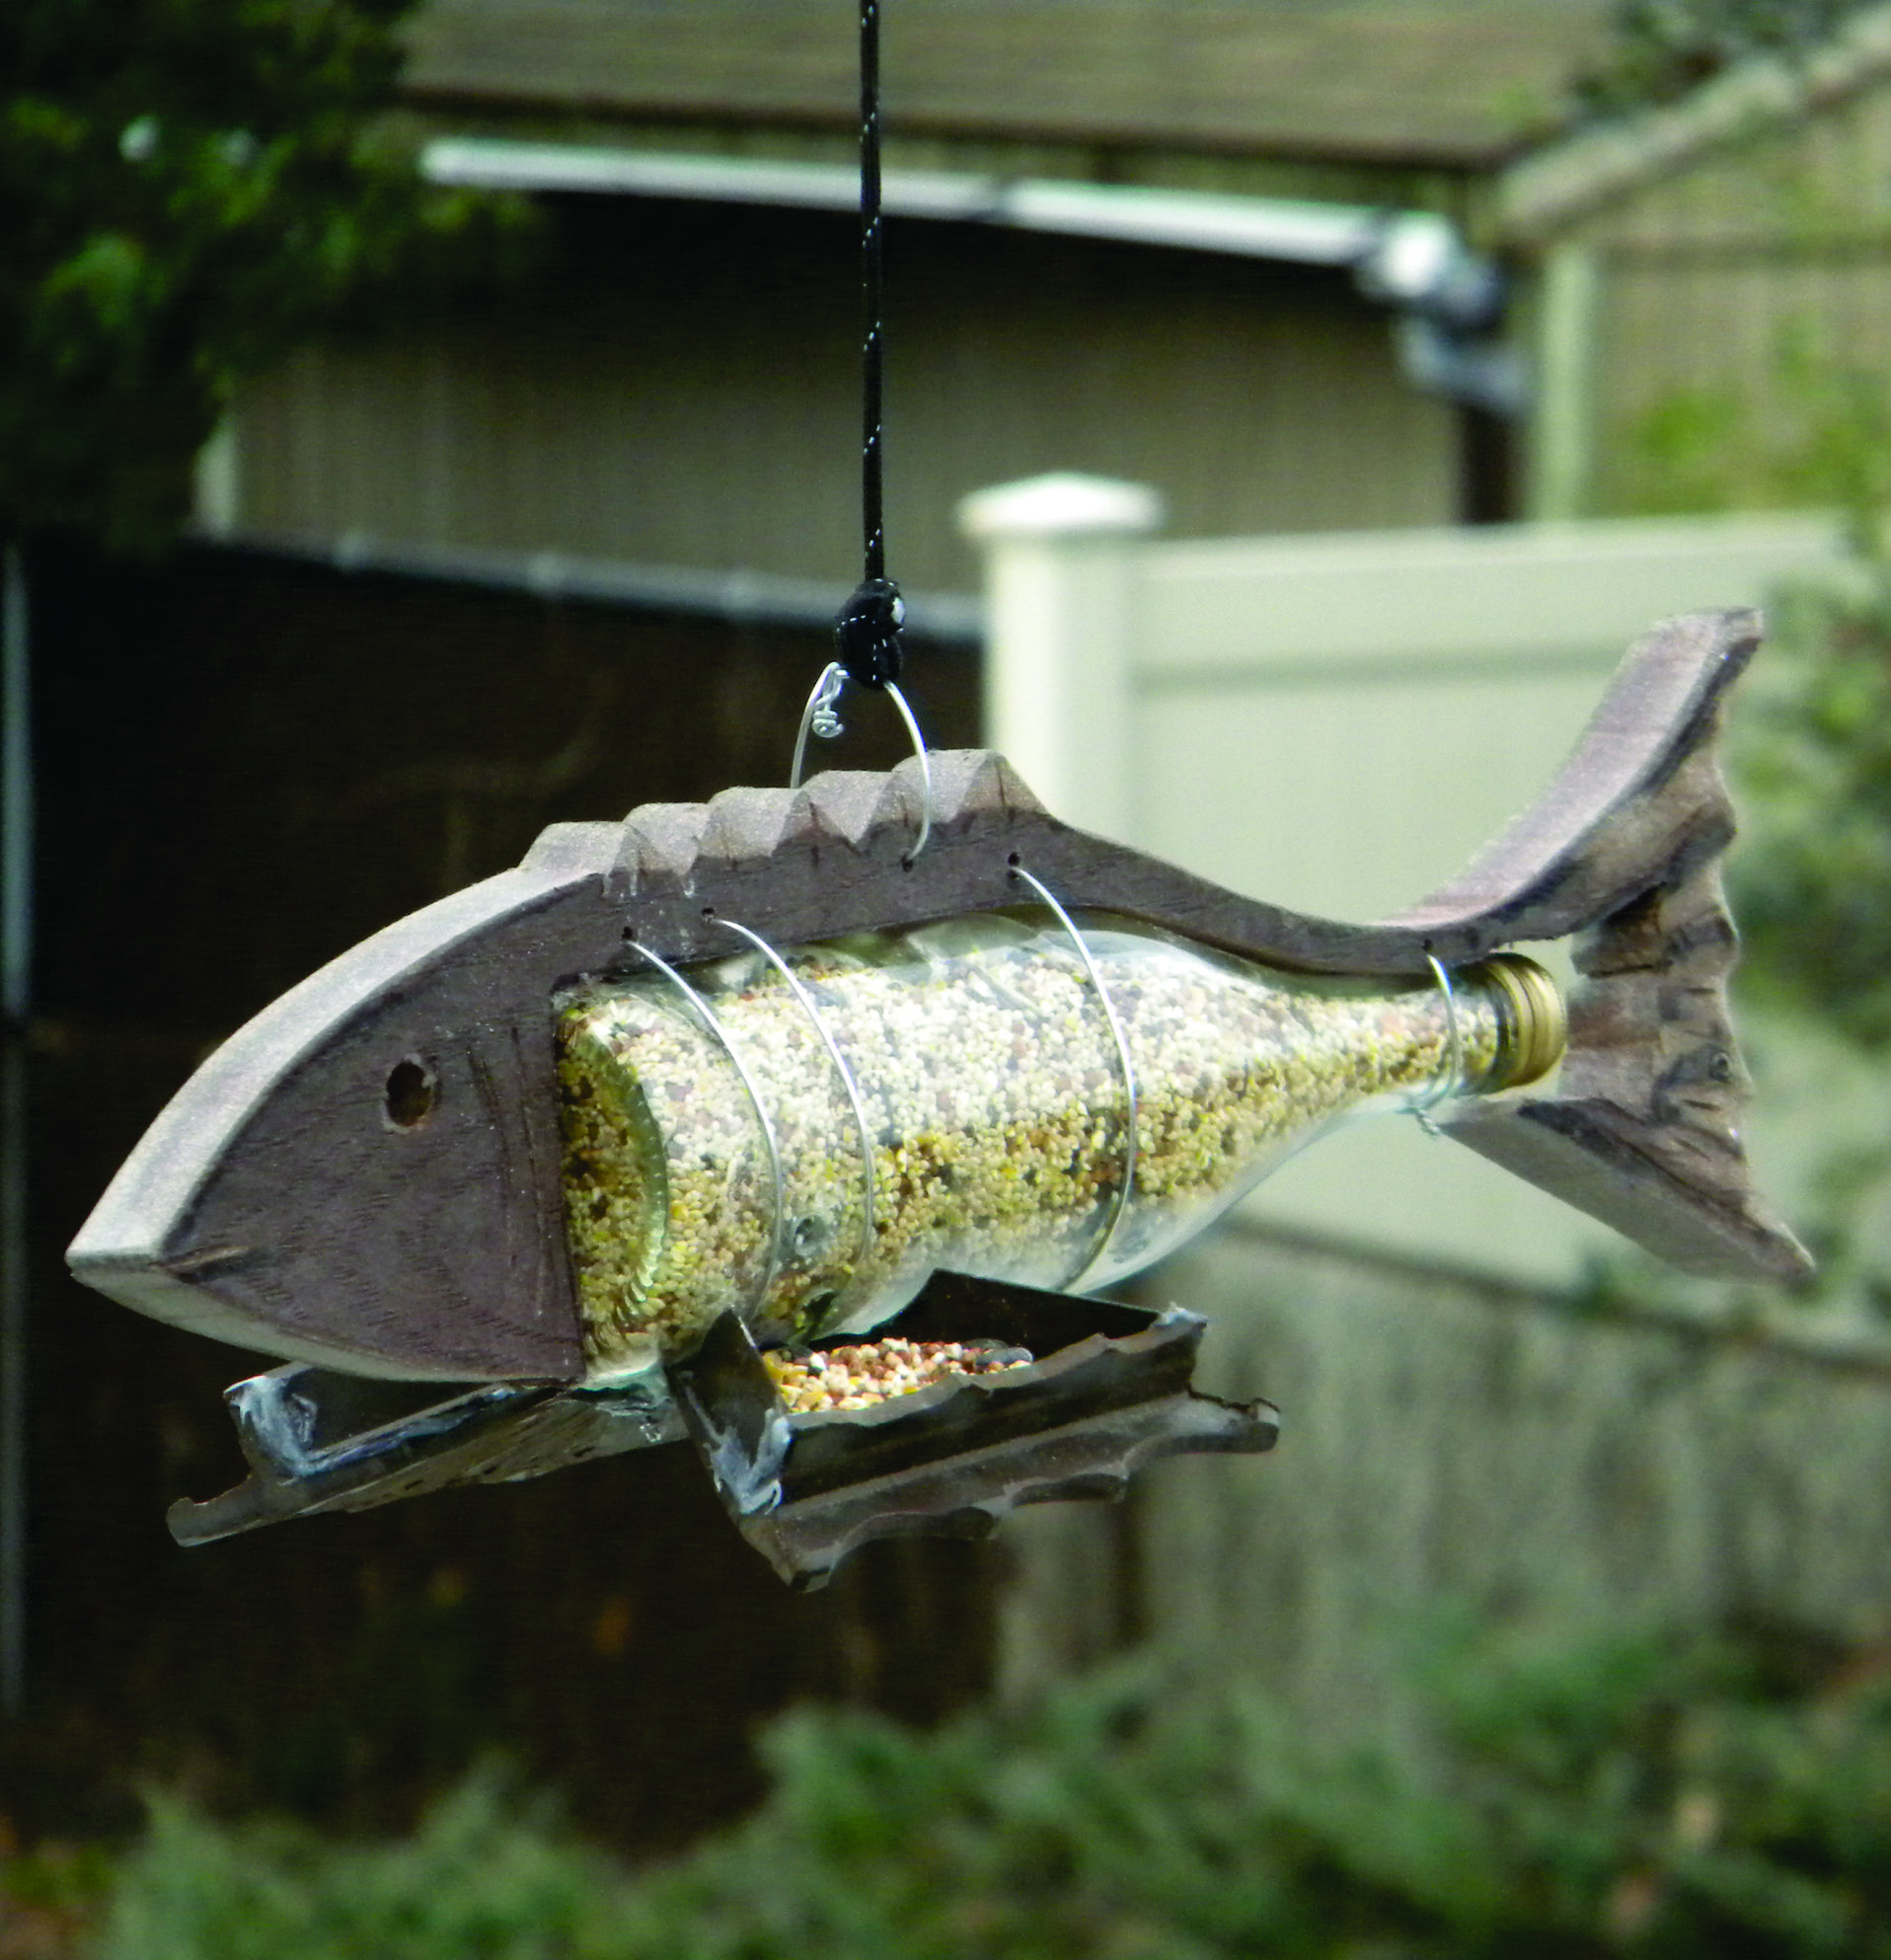 Diy nautical fish shaped wine bottle bird feeder www for How to make a bottle bird feeder